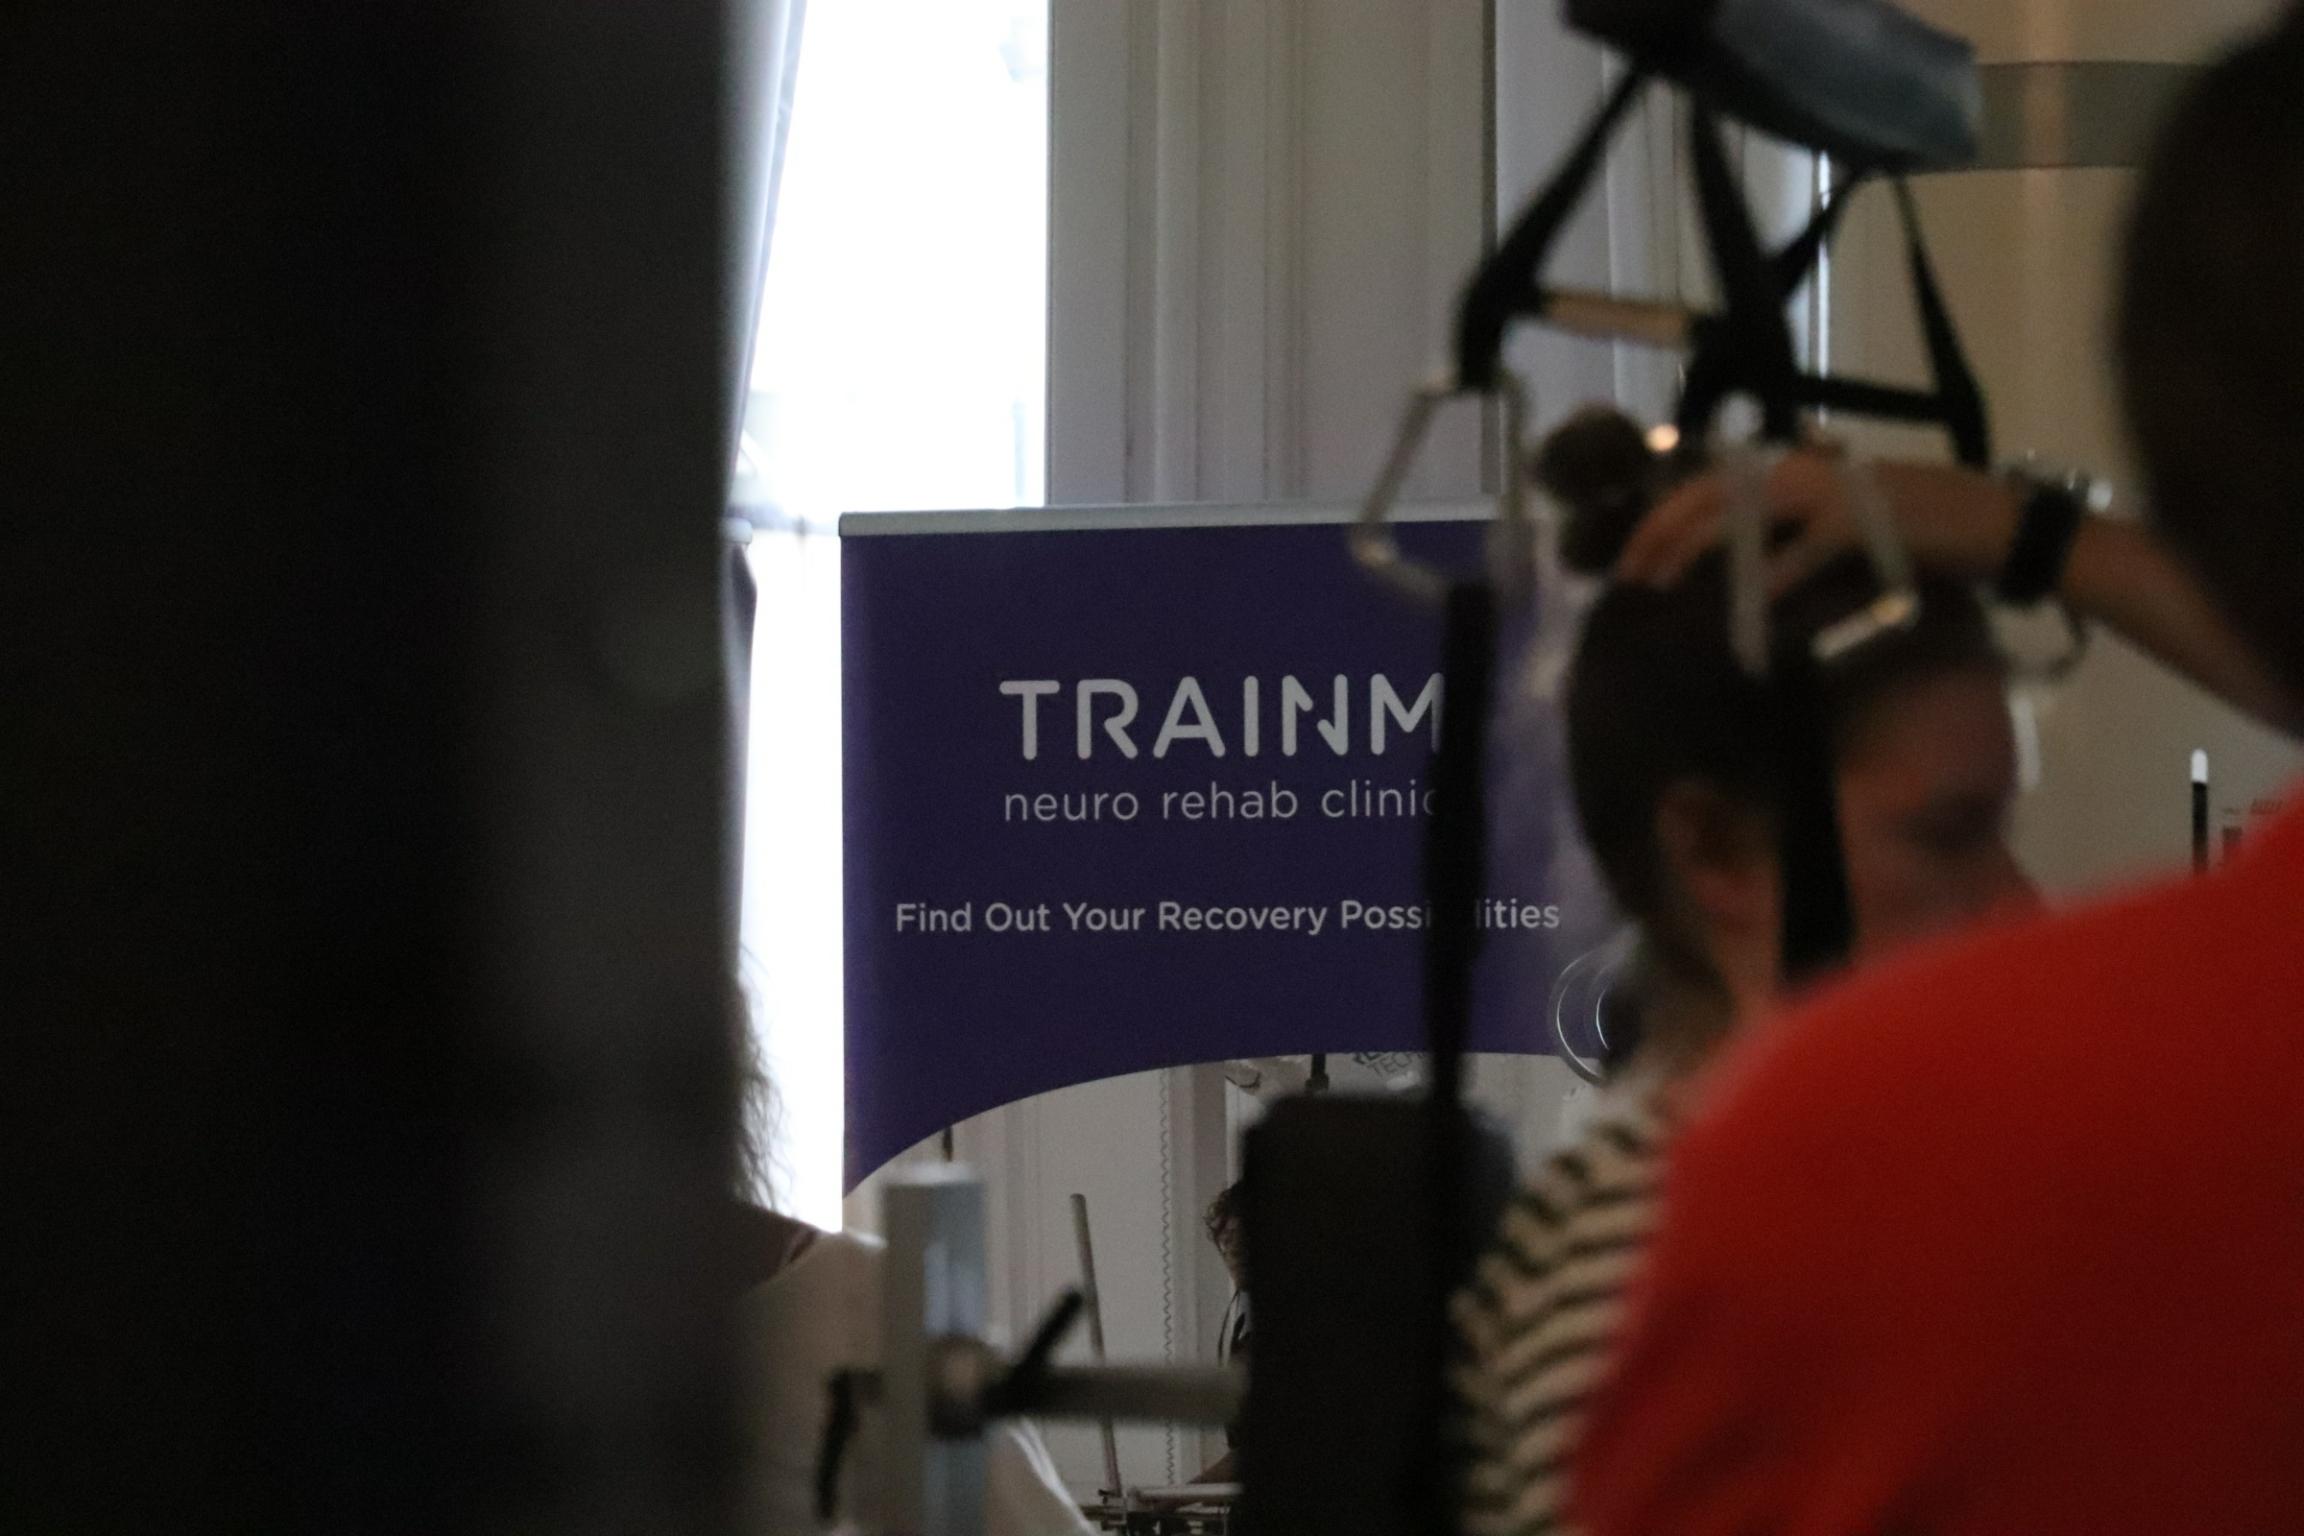 TRAINM neurorevalidatie